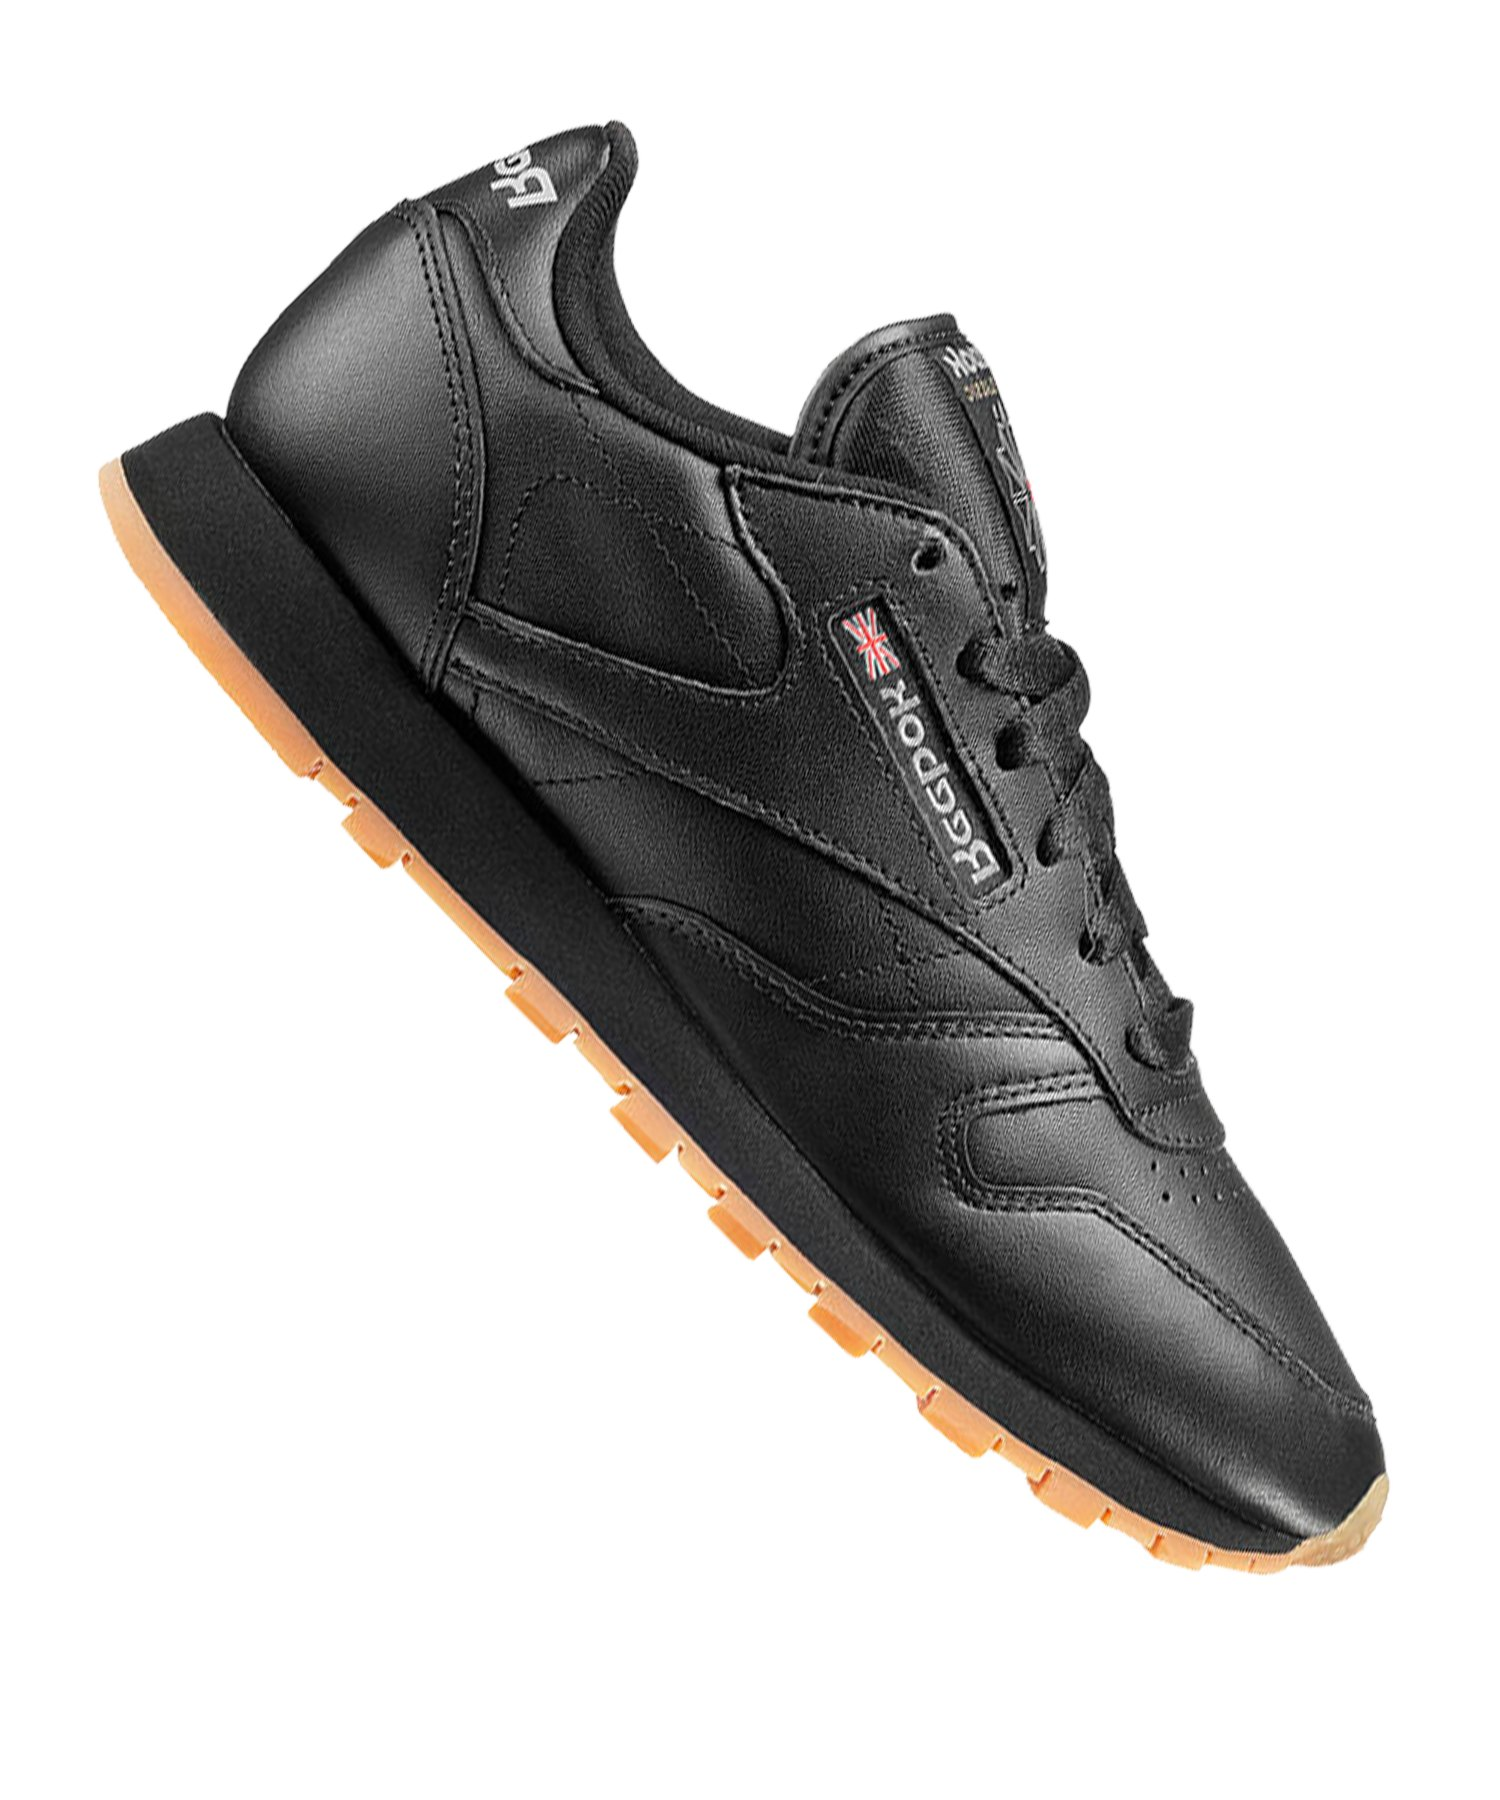 Reebok Classic Leather Sneaker Damen Schwarz - schwarz